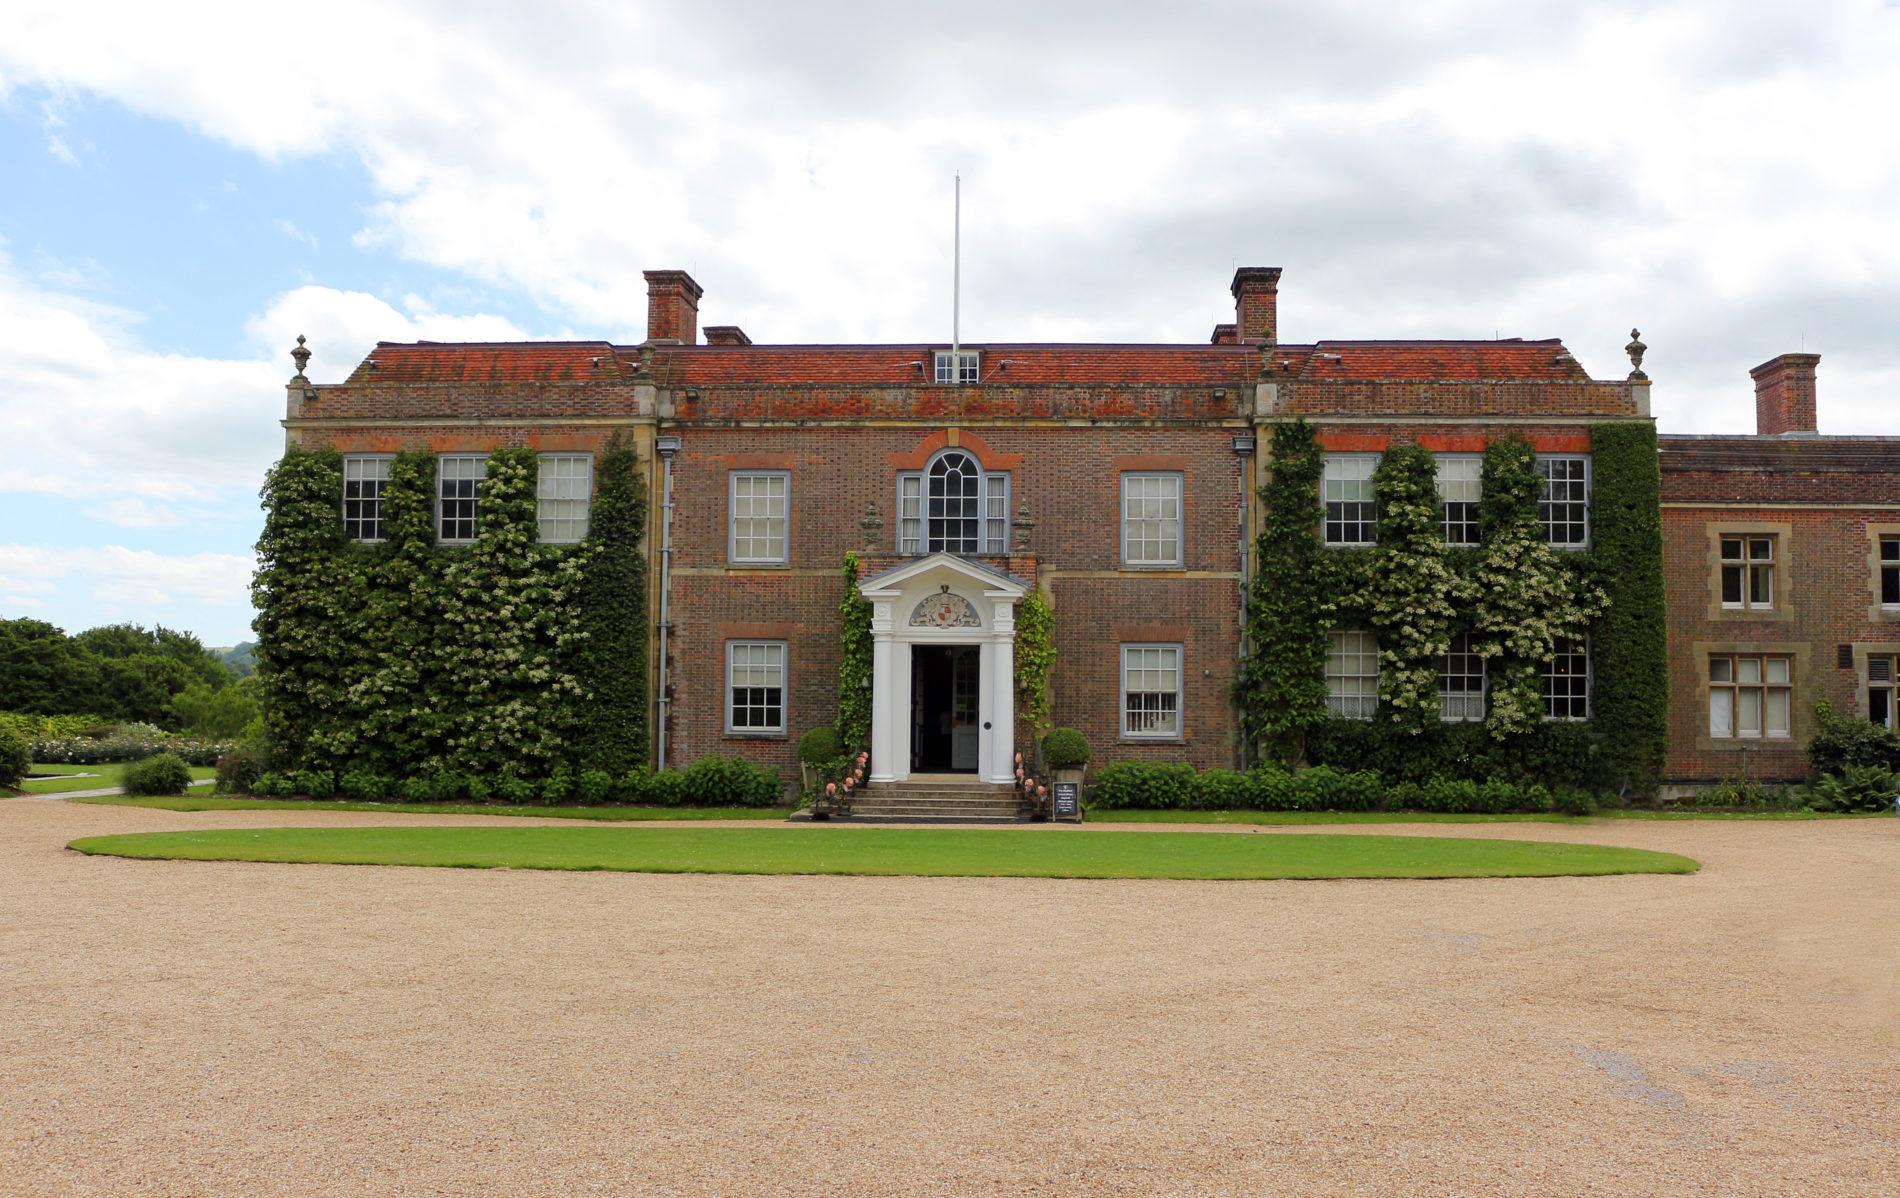 Historic Hinton Ampner house